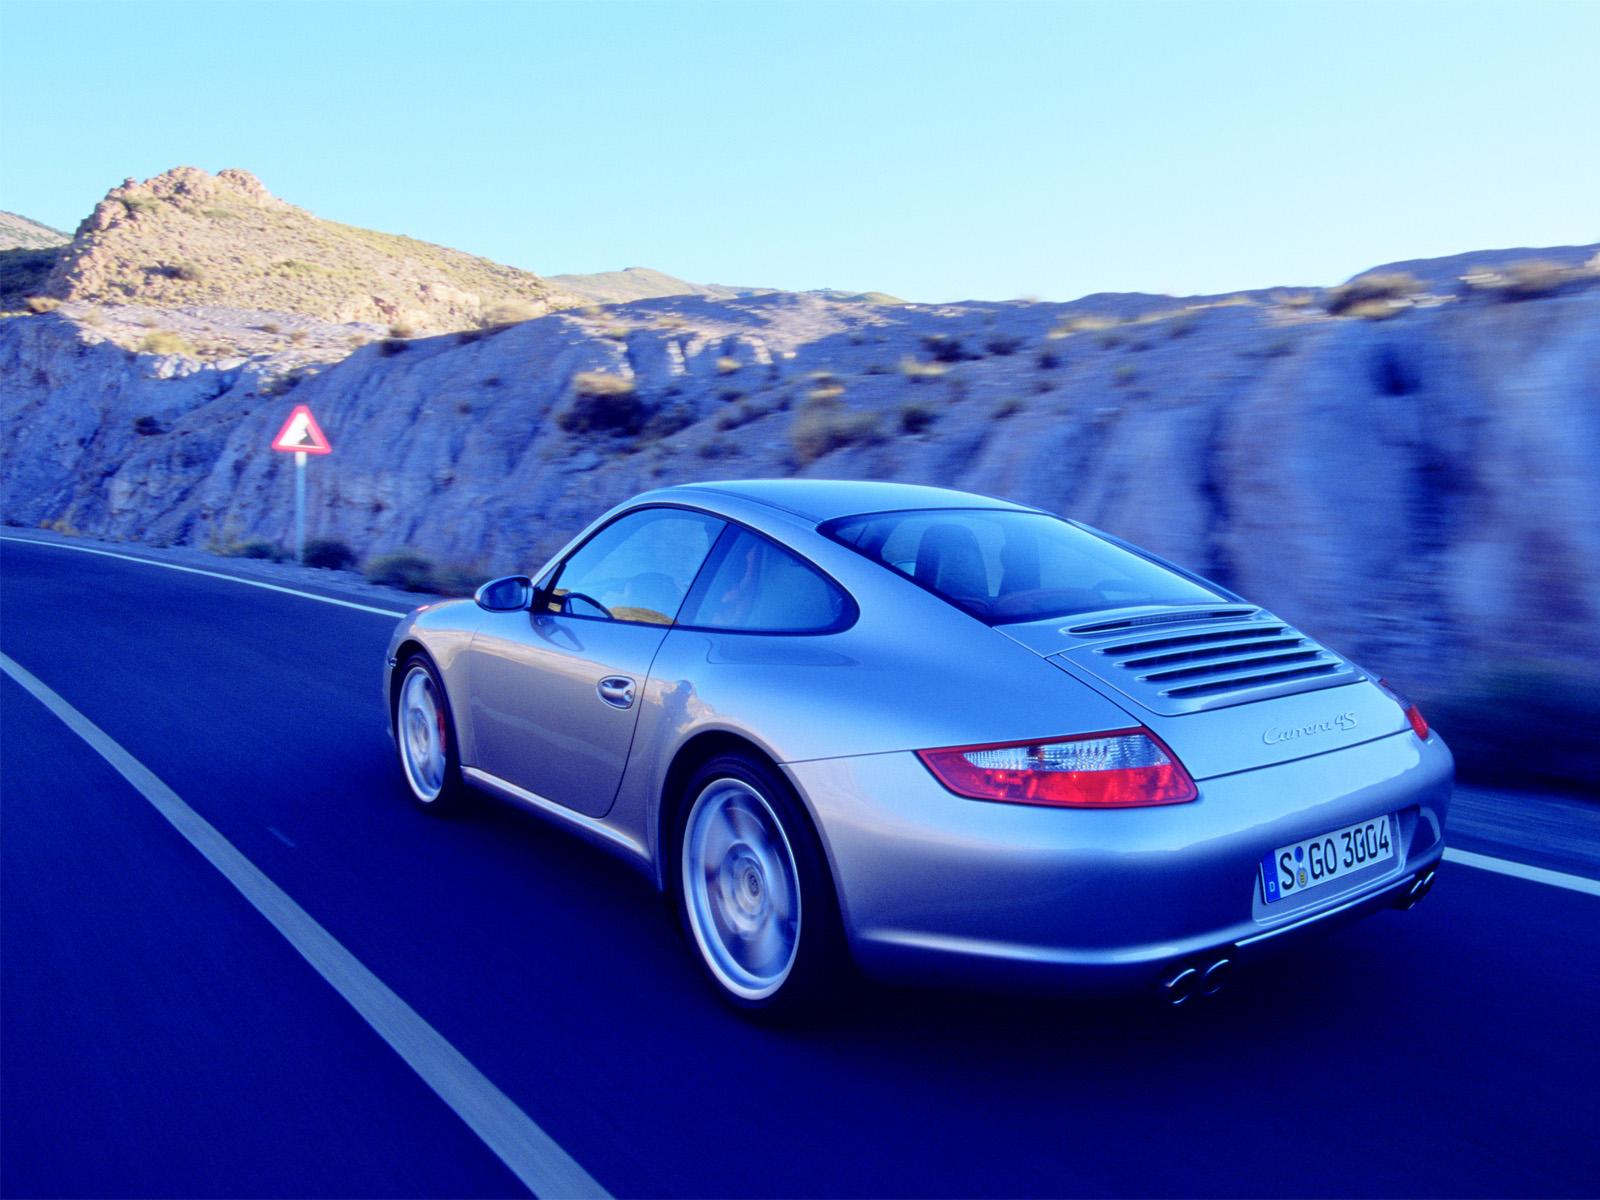 2006 porsche 911 carrera 4s wallpapers - Porsche 911 carrera s wallpaper ...